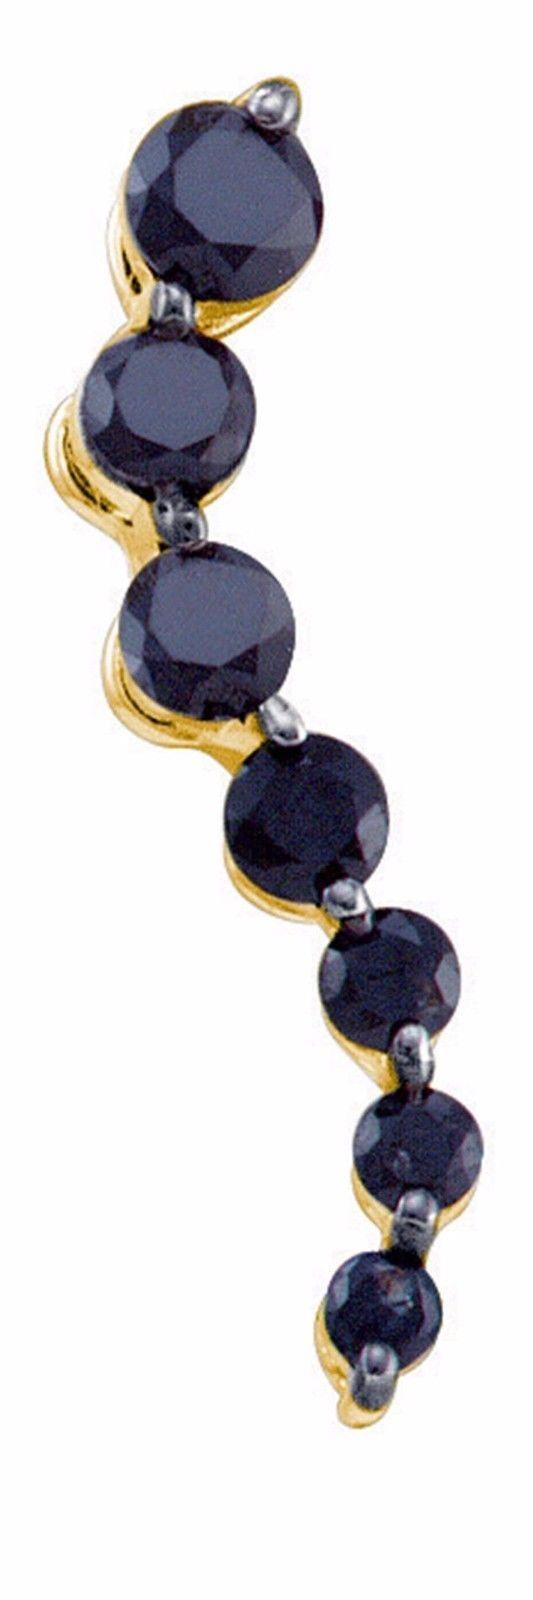 0.28CT Black/White Diamond 10K Yellow Gold Journey Pendant - Genuine Diamond